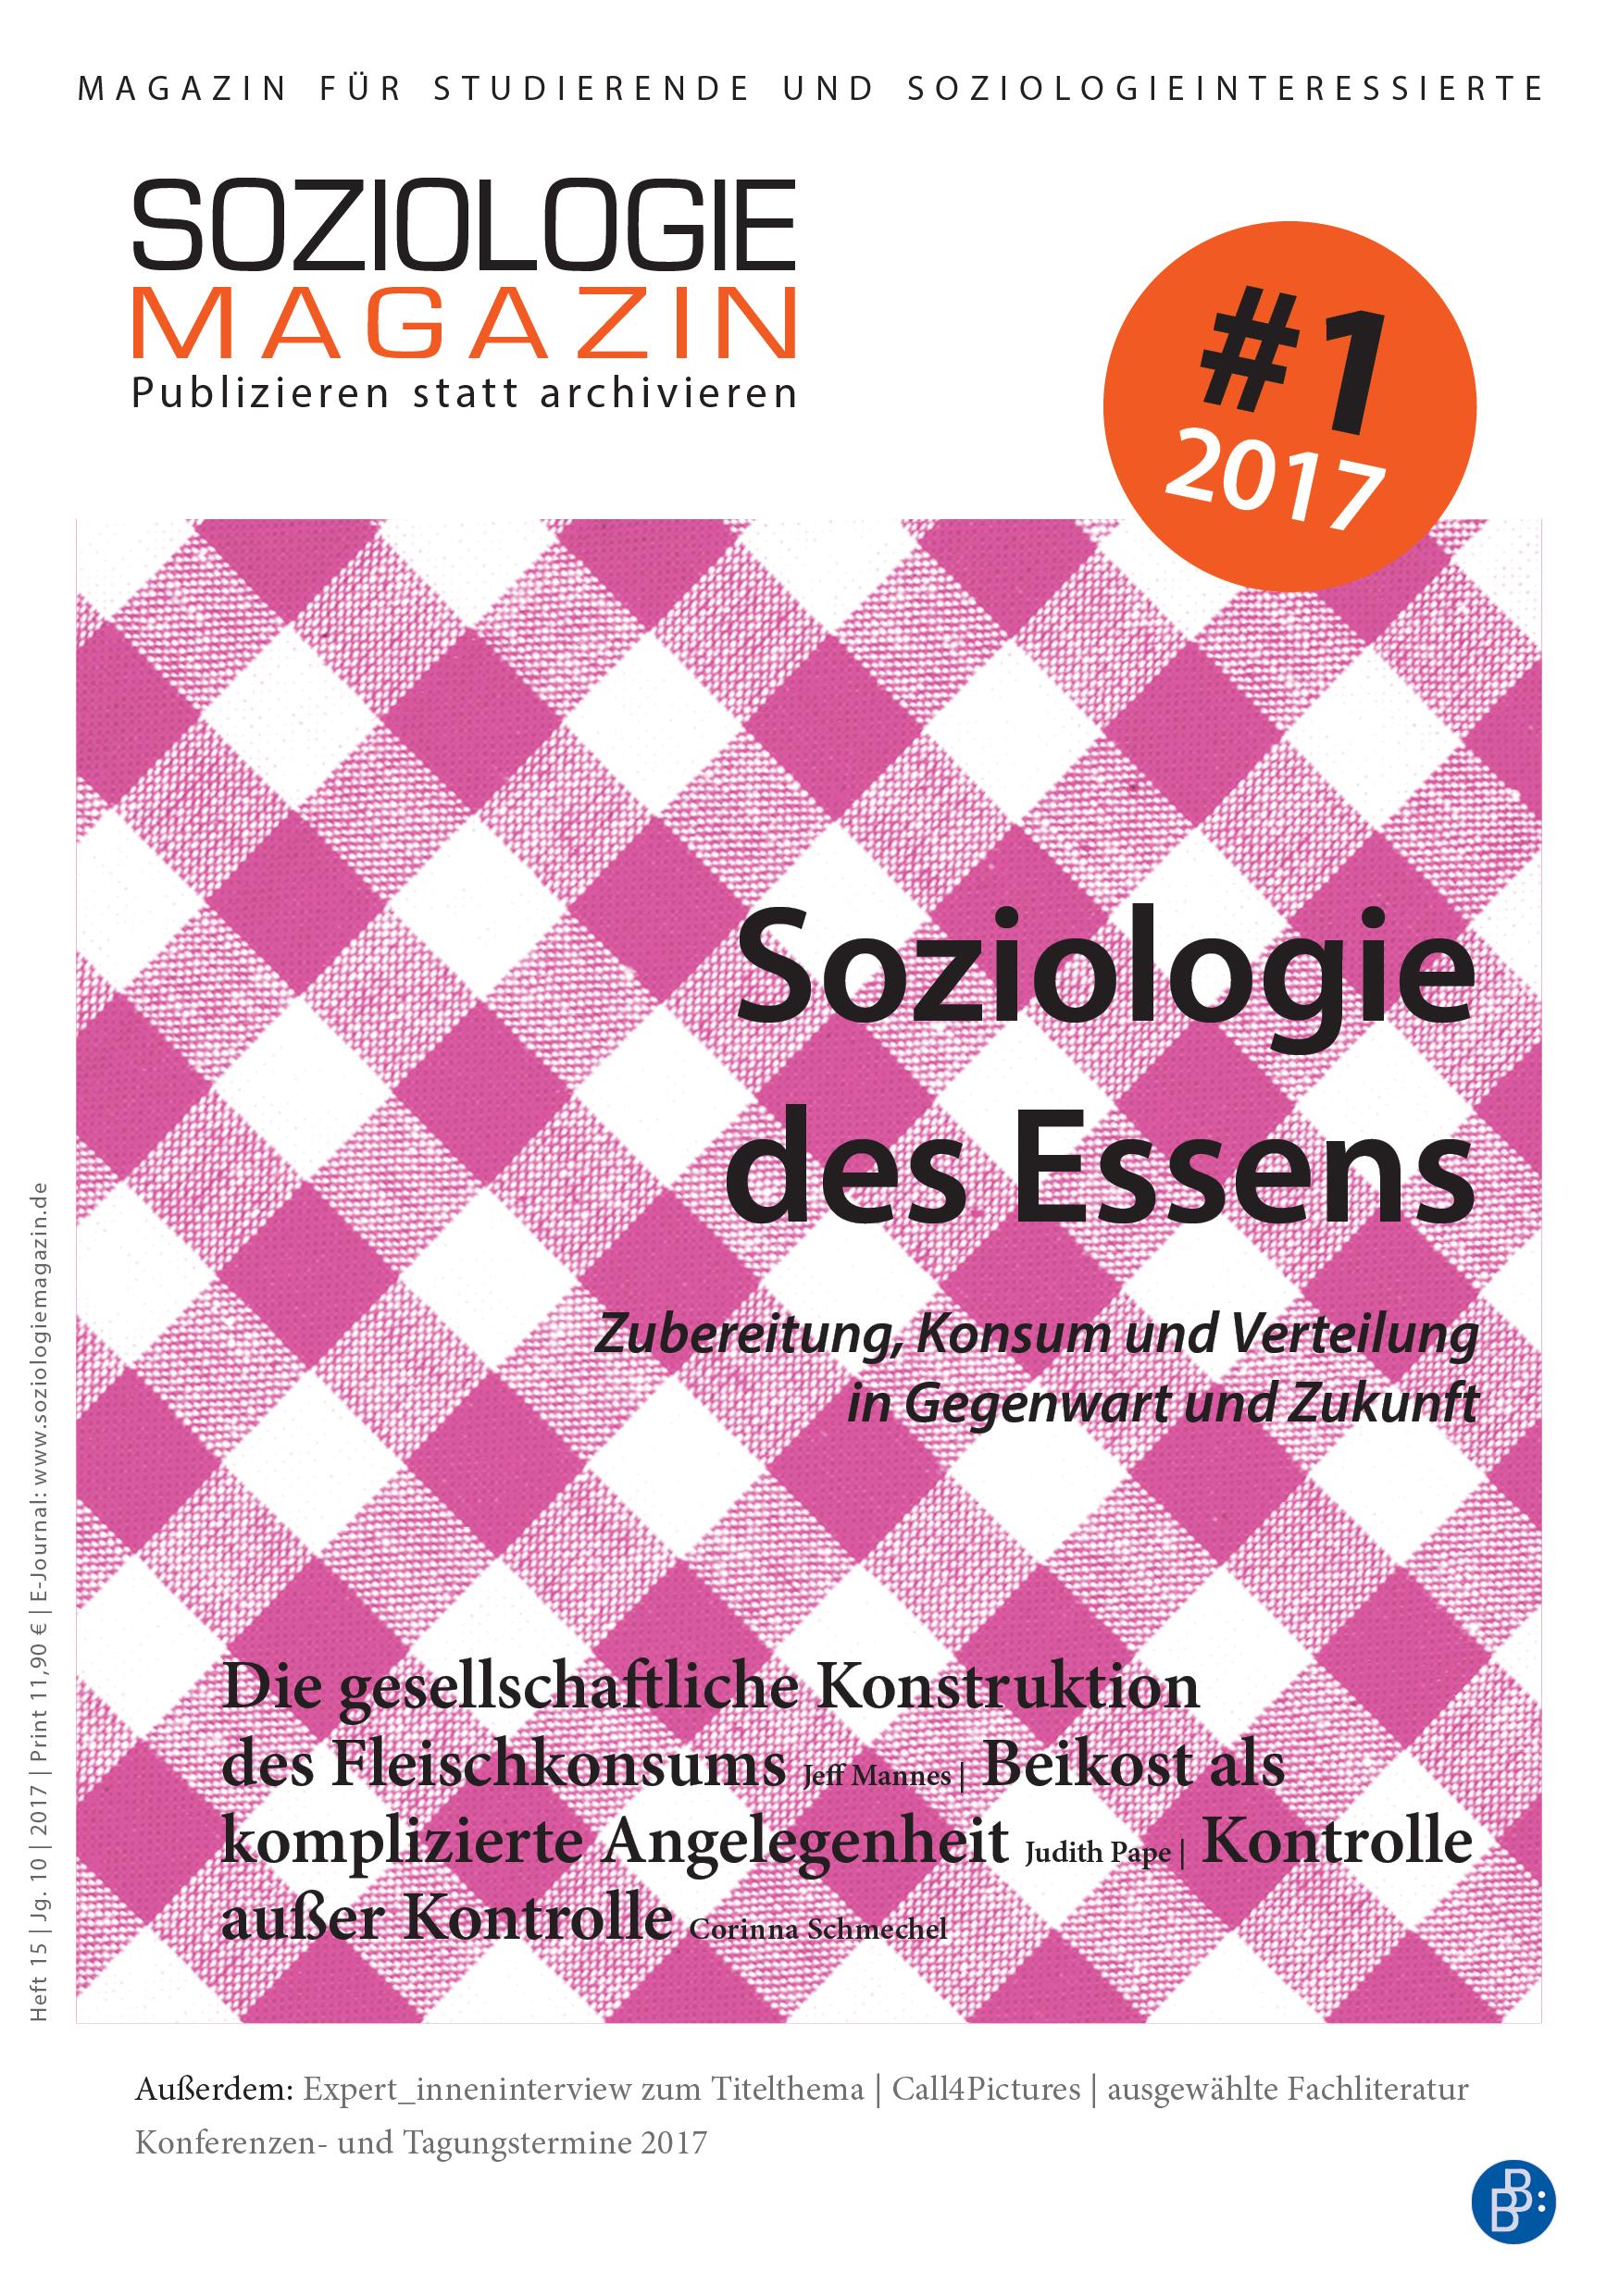 Soziologiemagazin 1-2017 | Soziologie des Essens